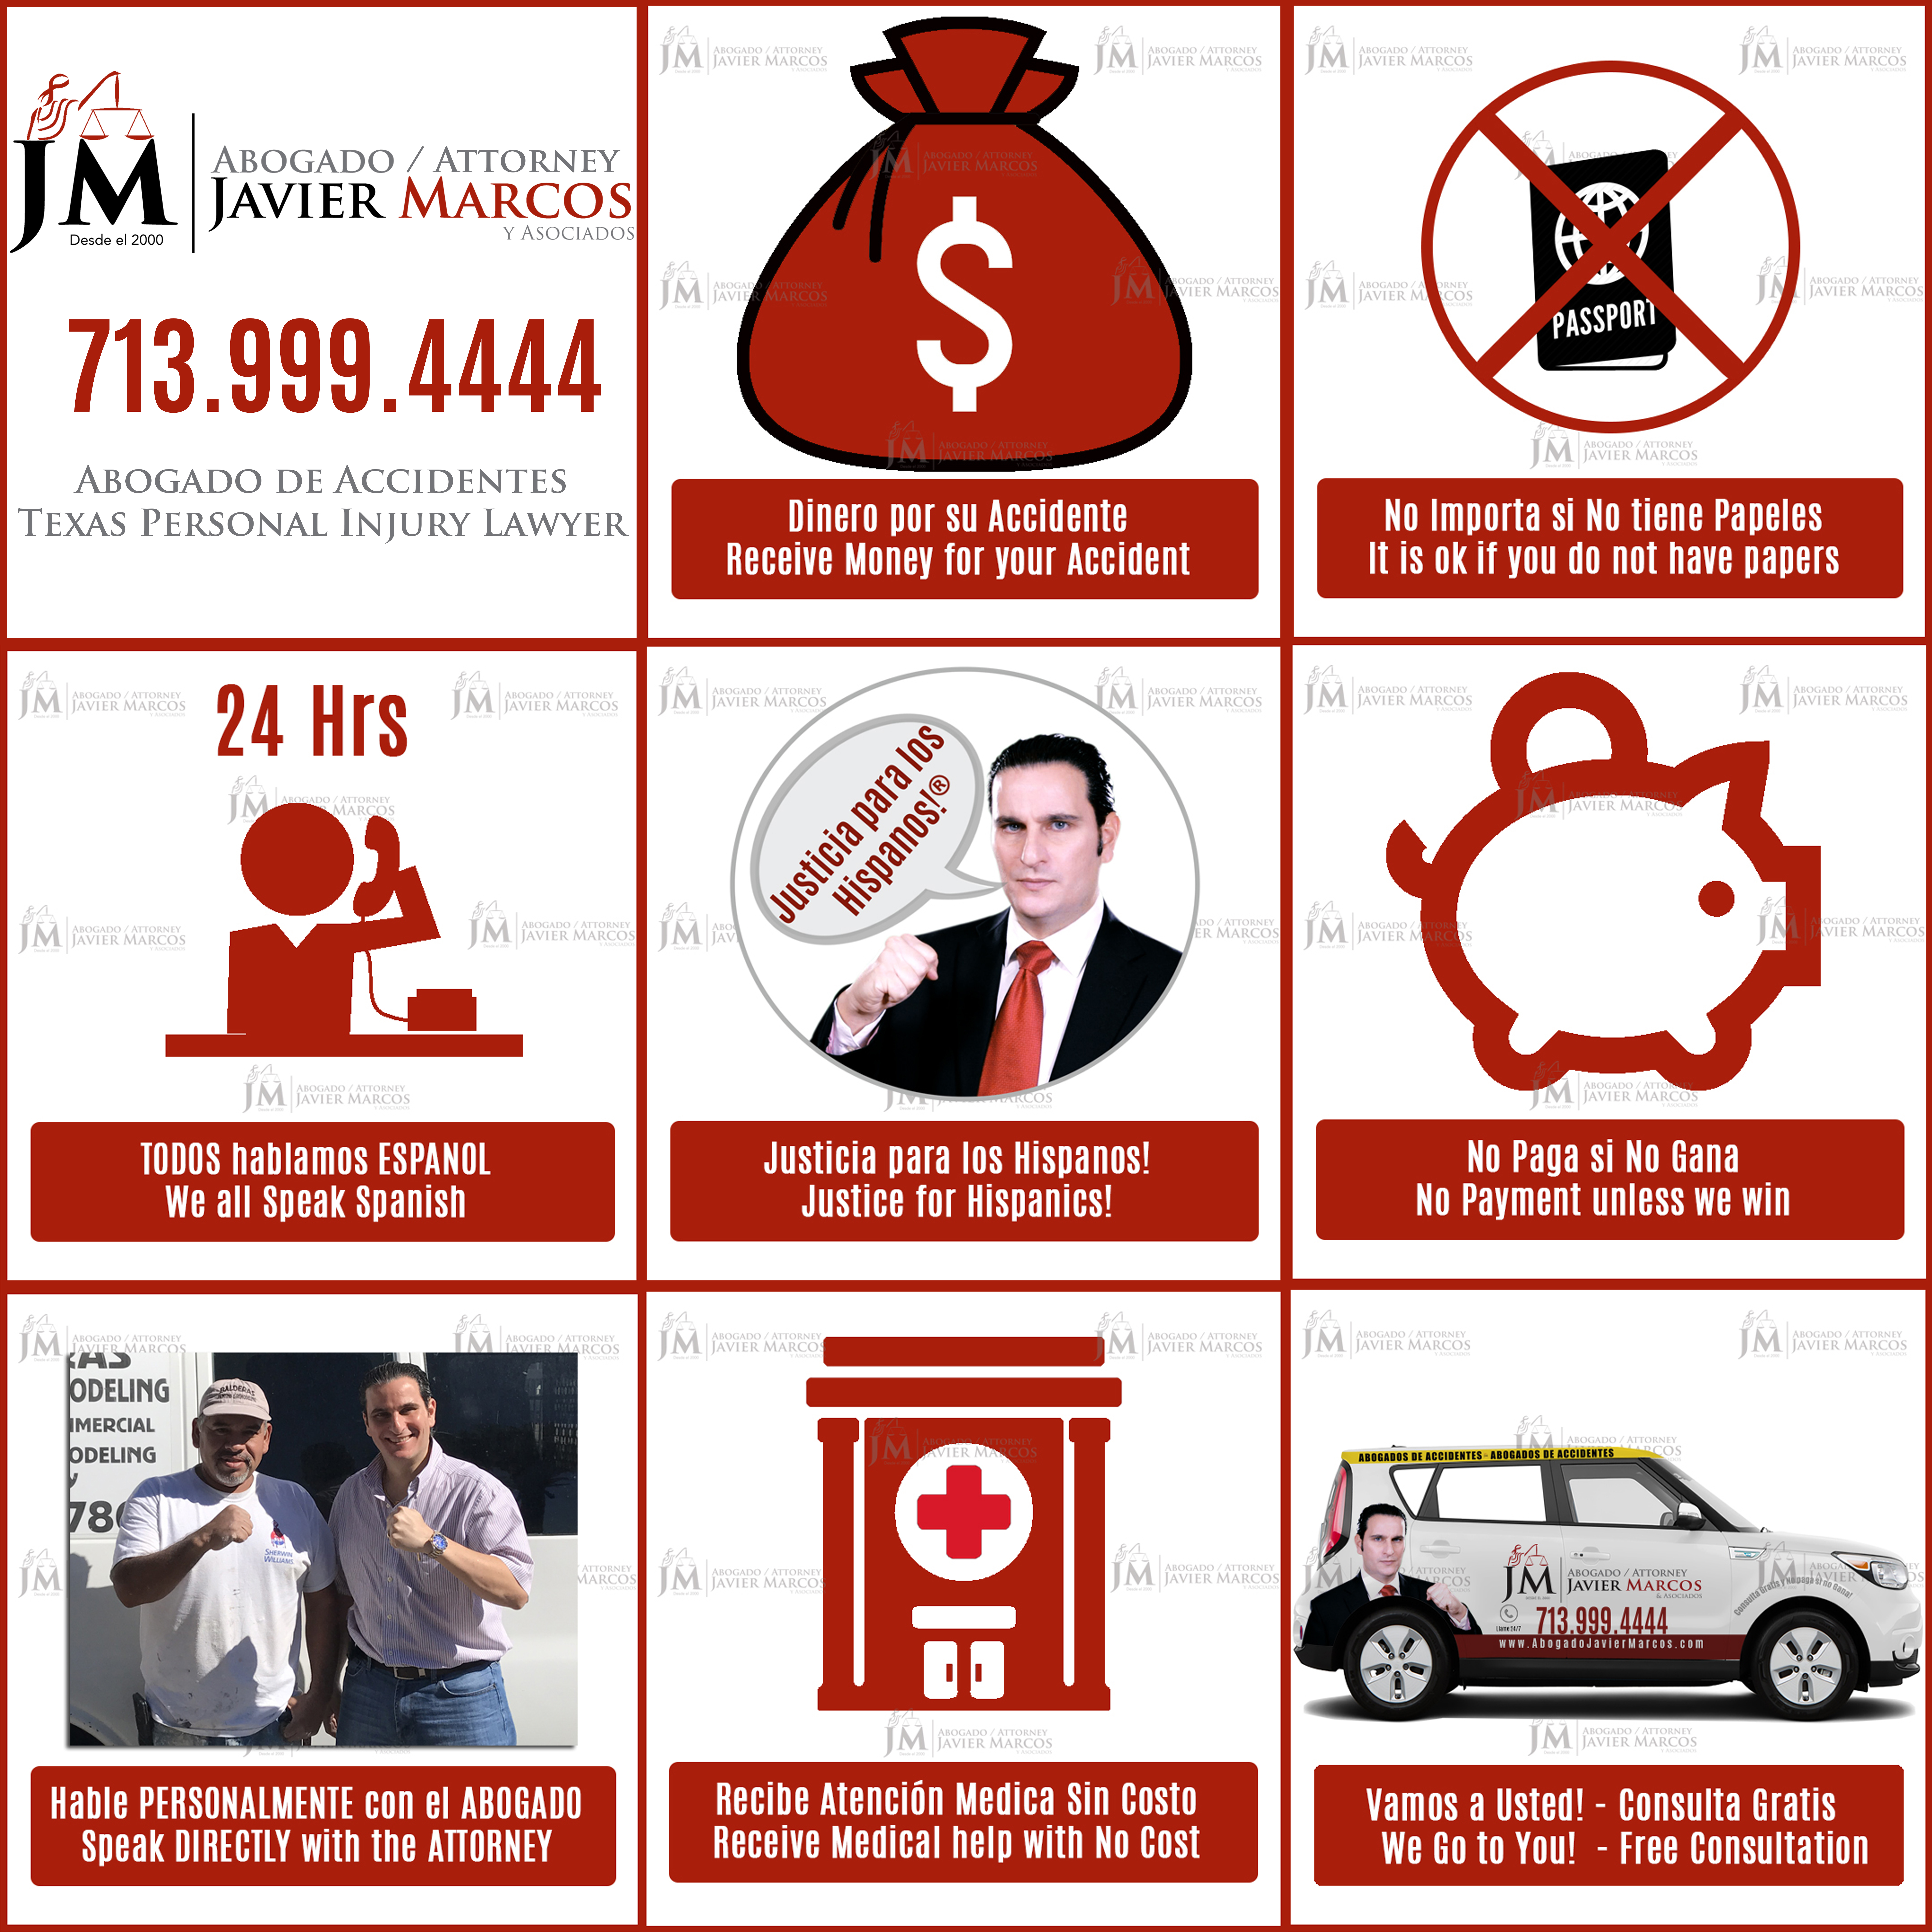 Attorney Javier Marcos   Personal Injury Attorney   713.999.4444